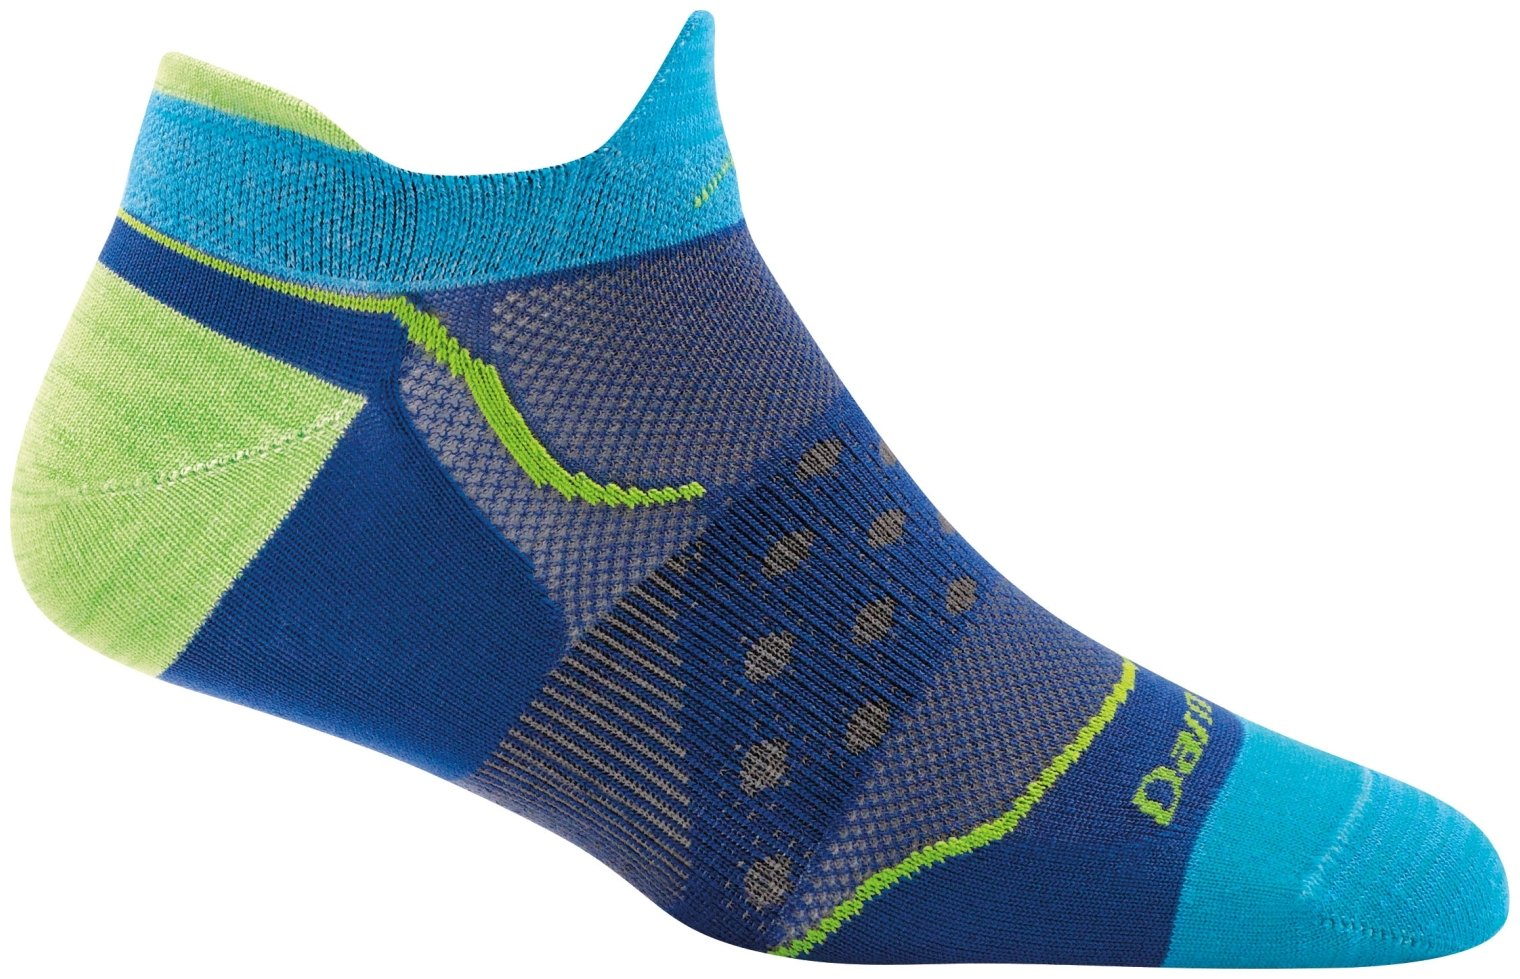 Darn Tough Dot No Show Tab Ultralight Sock - Women's Marine Medium